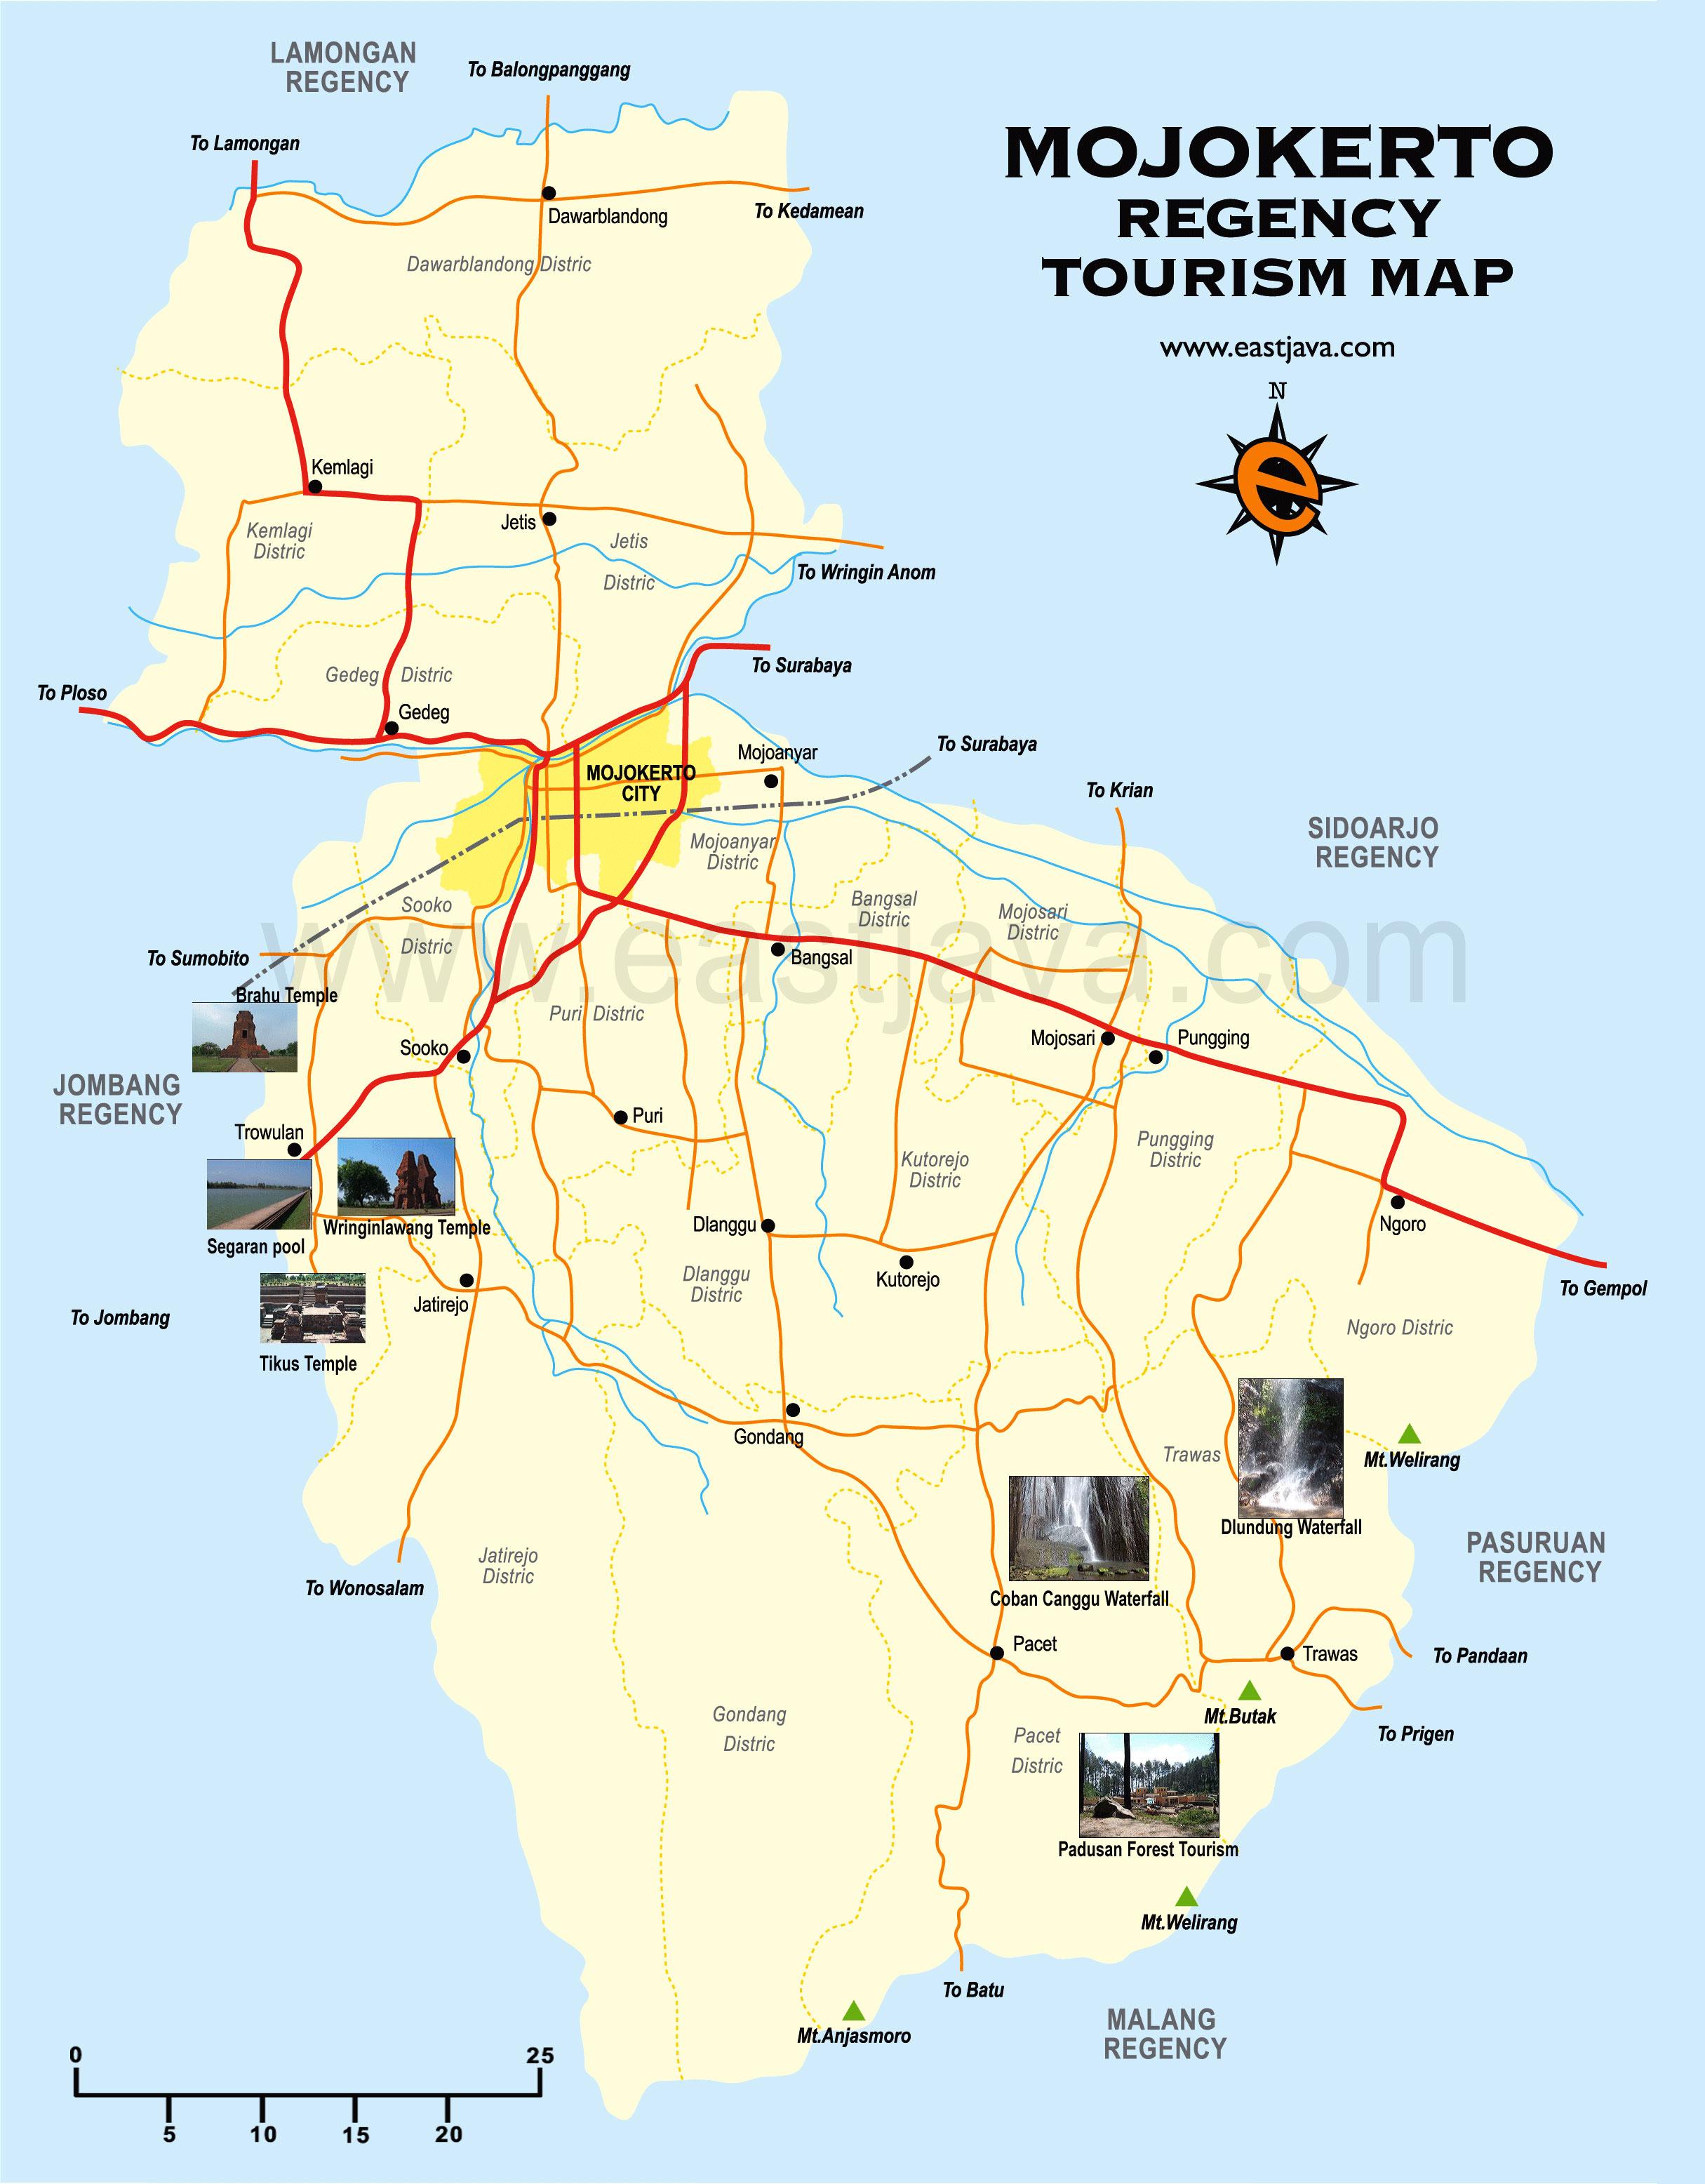 Mojokerto Map Peta Kabupaten Google Reco Lanang Kab